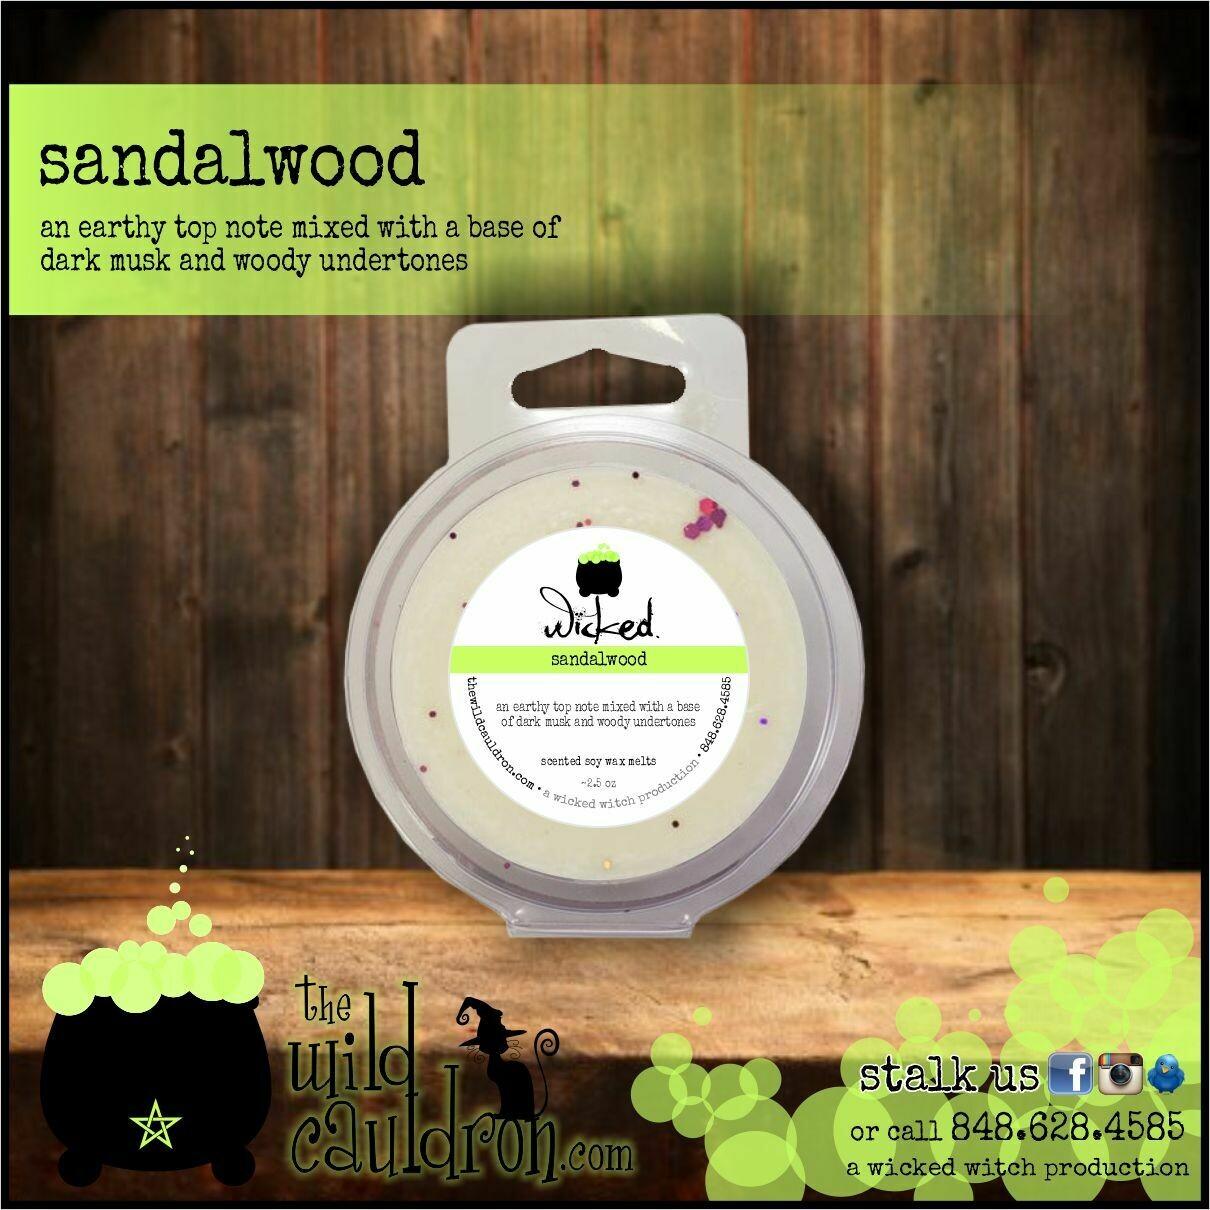 Sandalwood Wicked Wax Melts